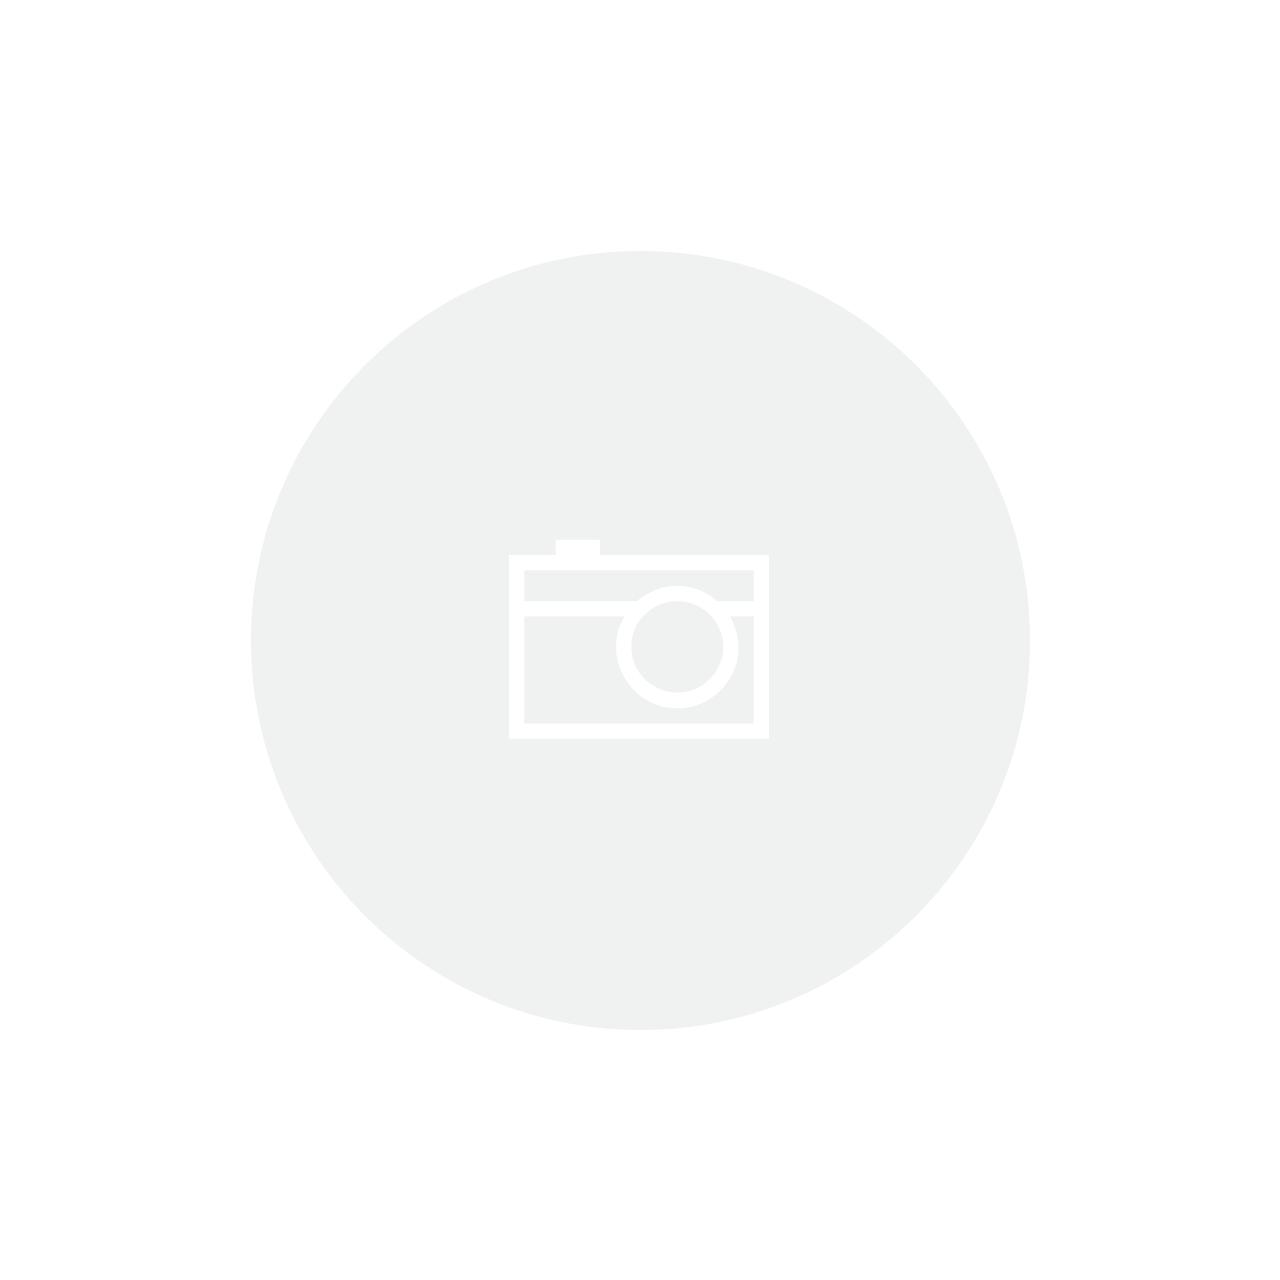 Colher Nylon Utilitá Tramontina